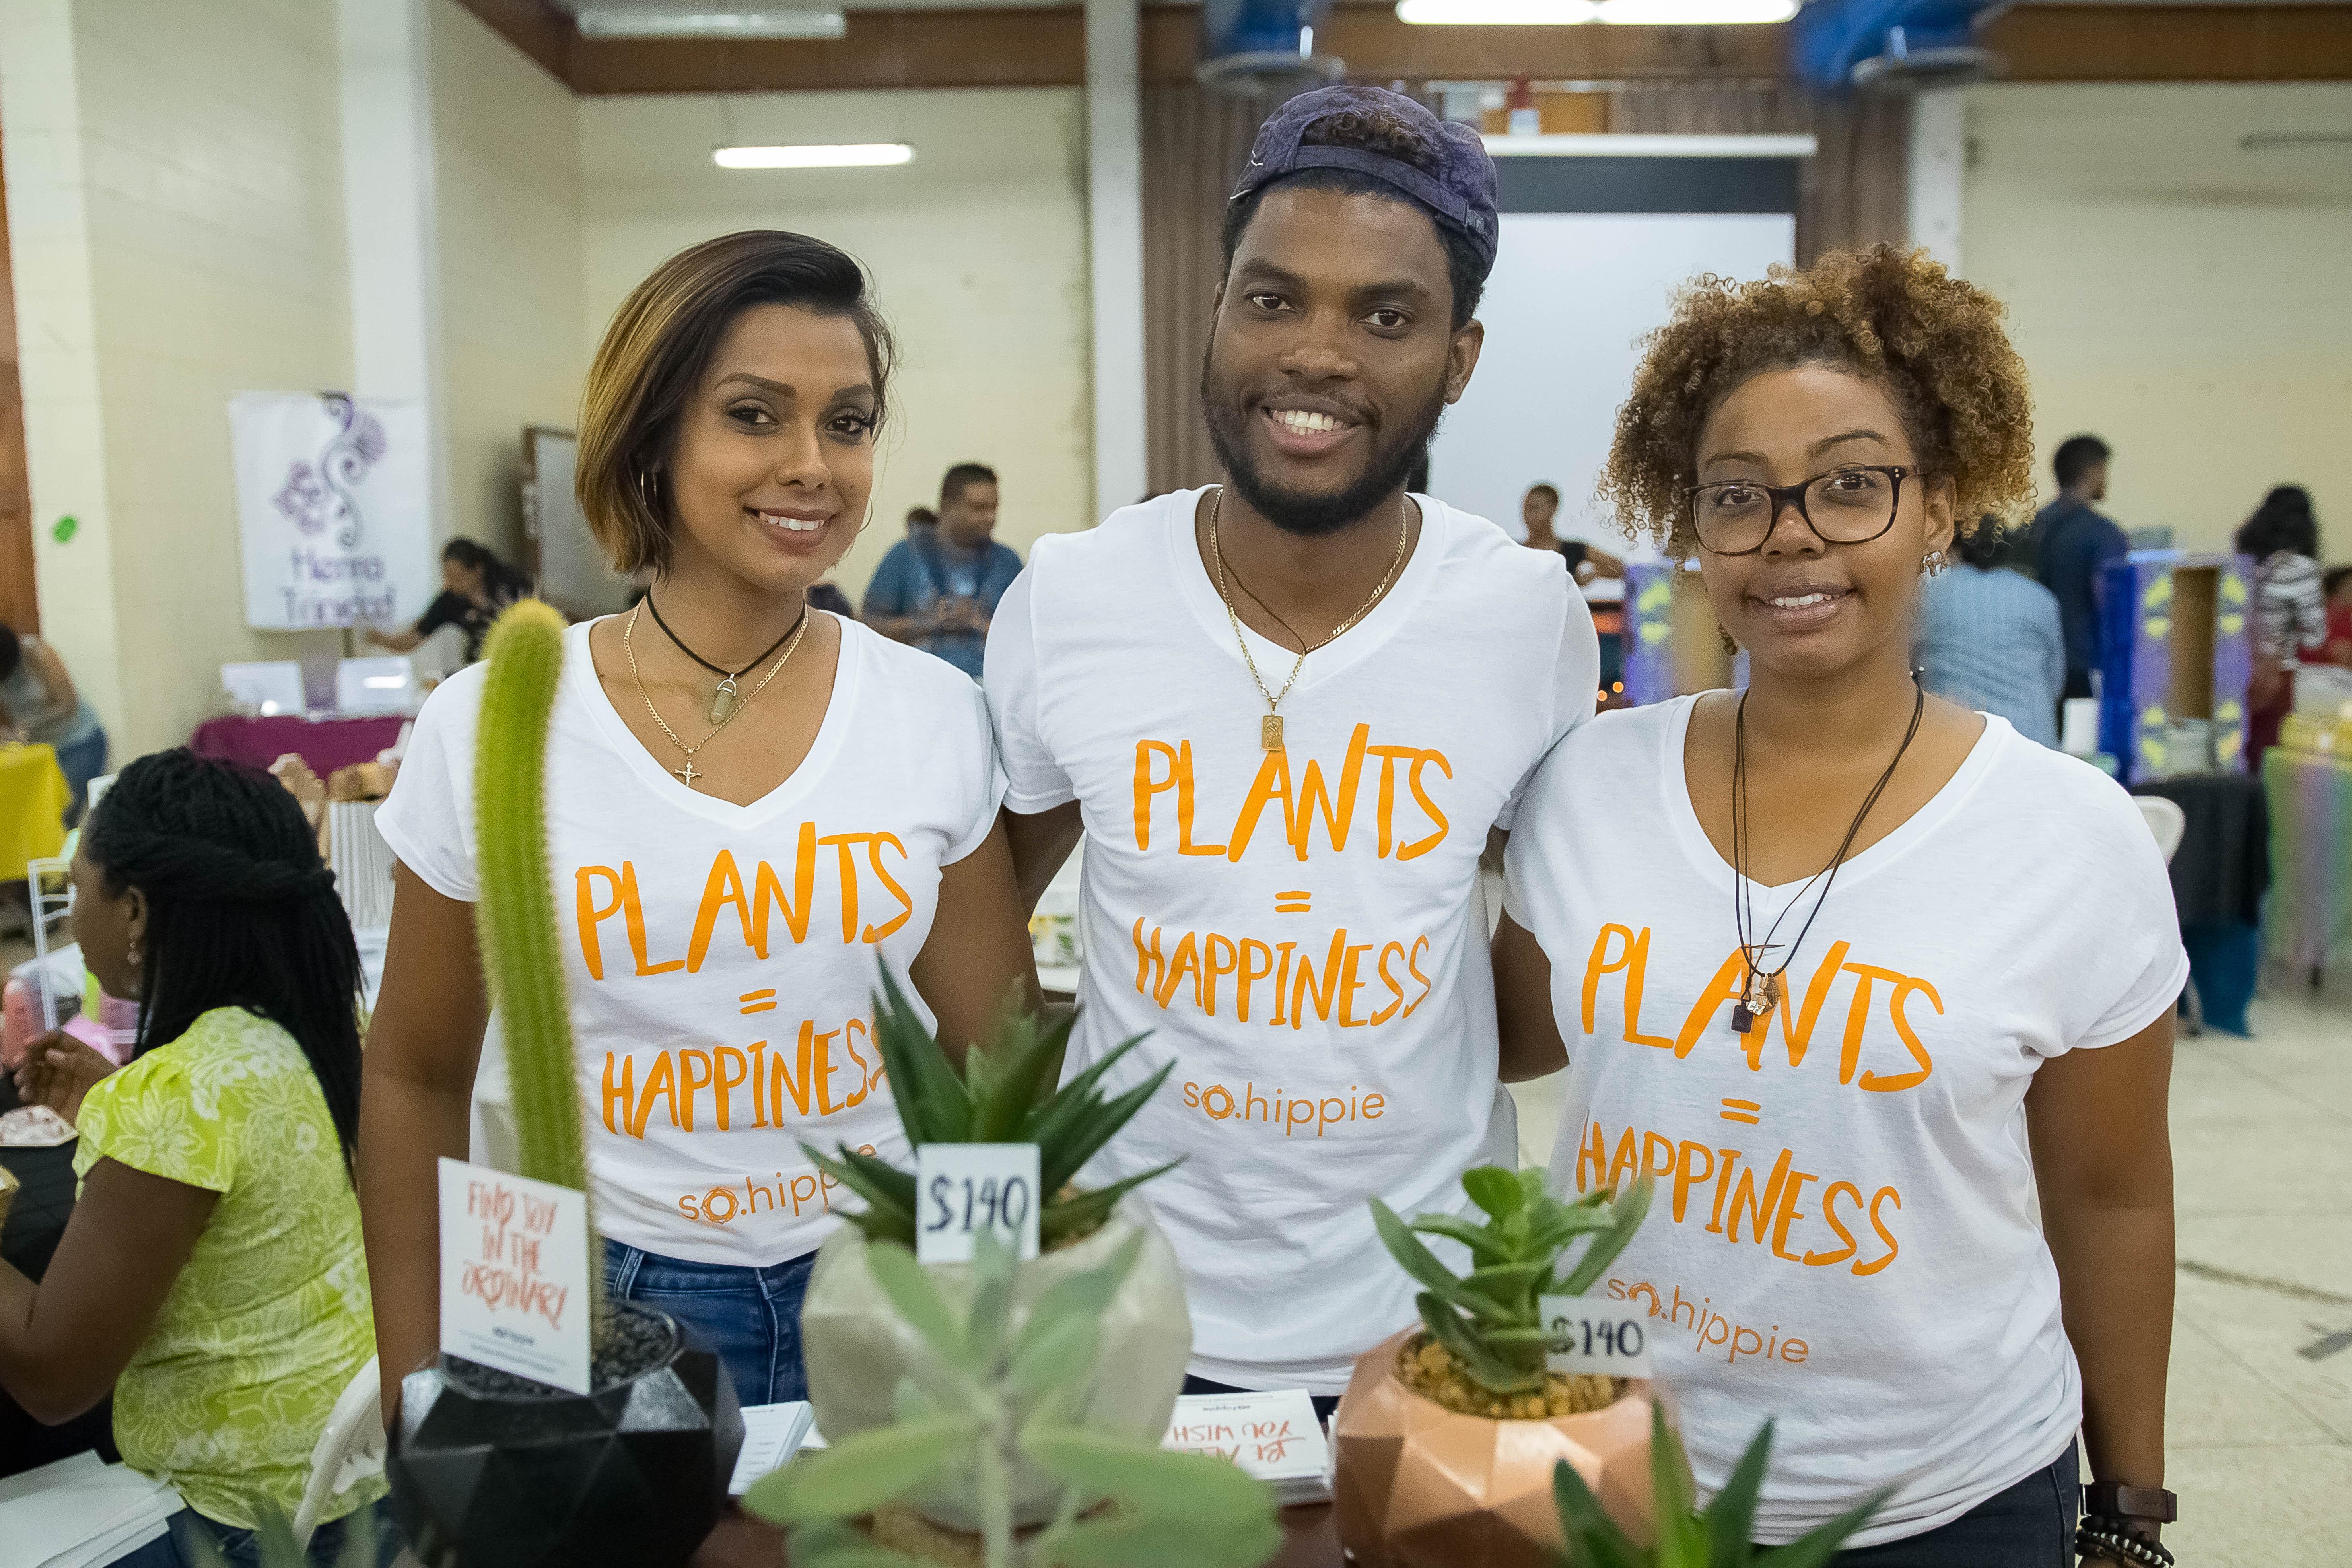 Plants at Things TT